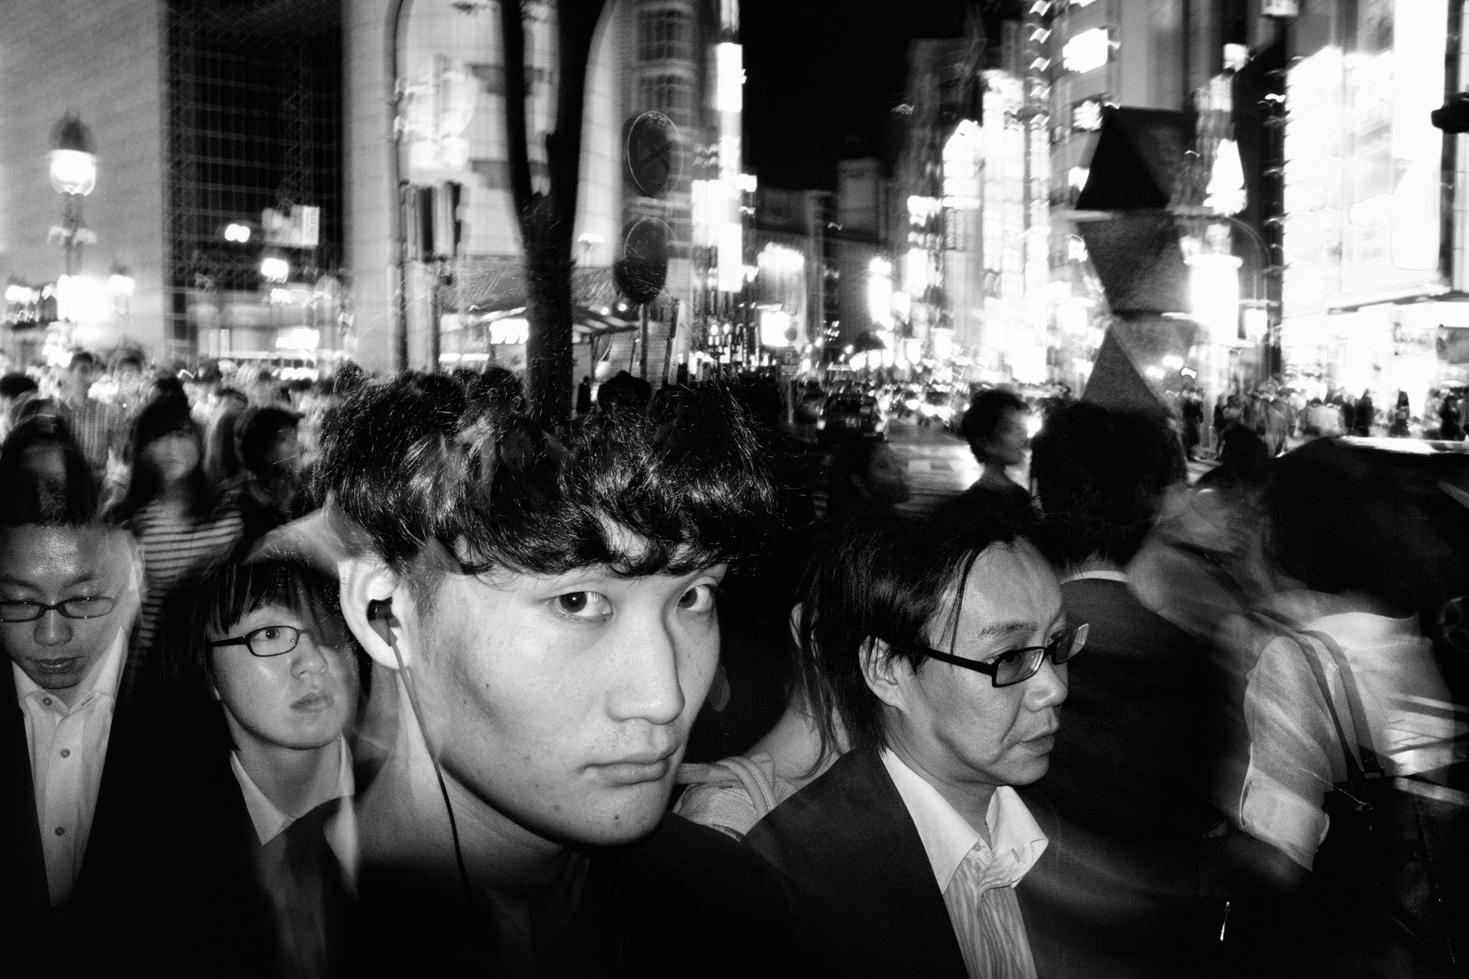 tatsuo suzuki japan street photography 9